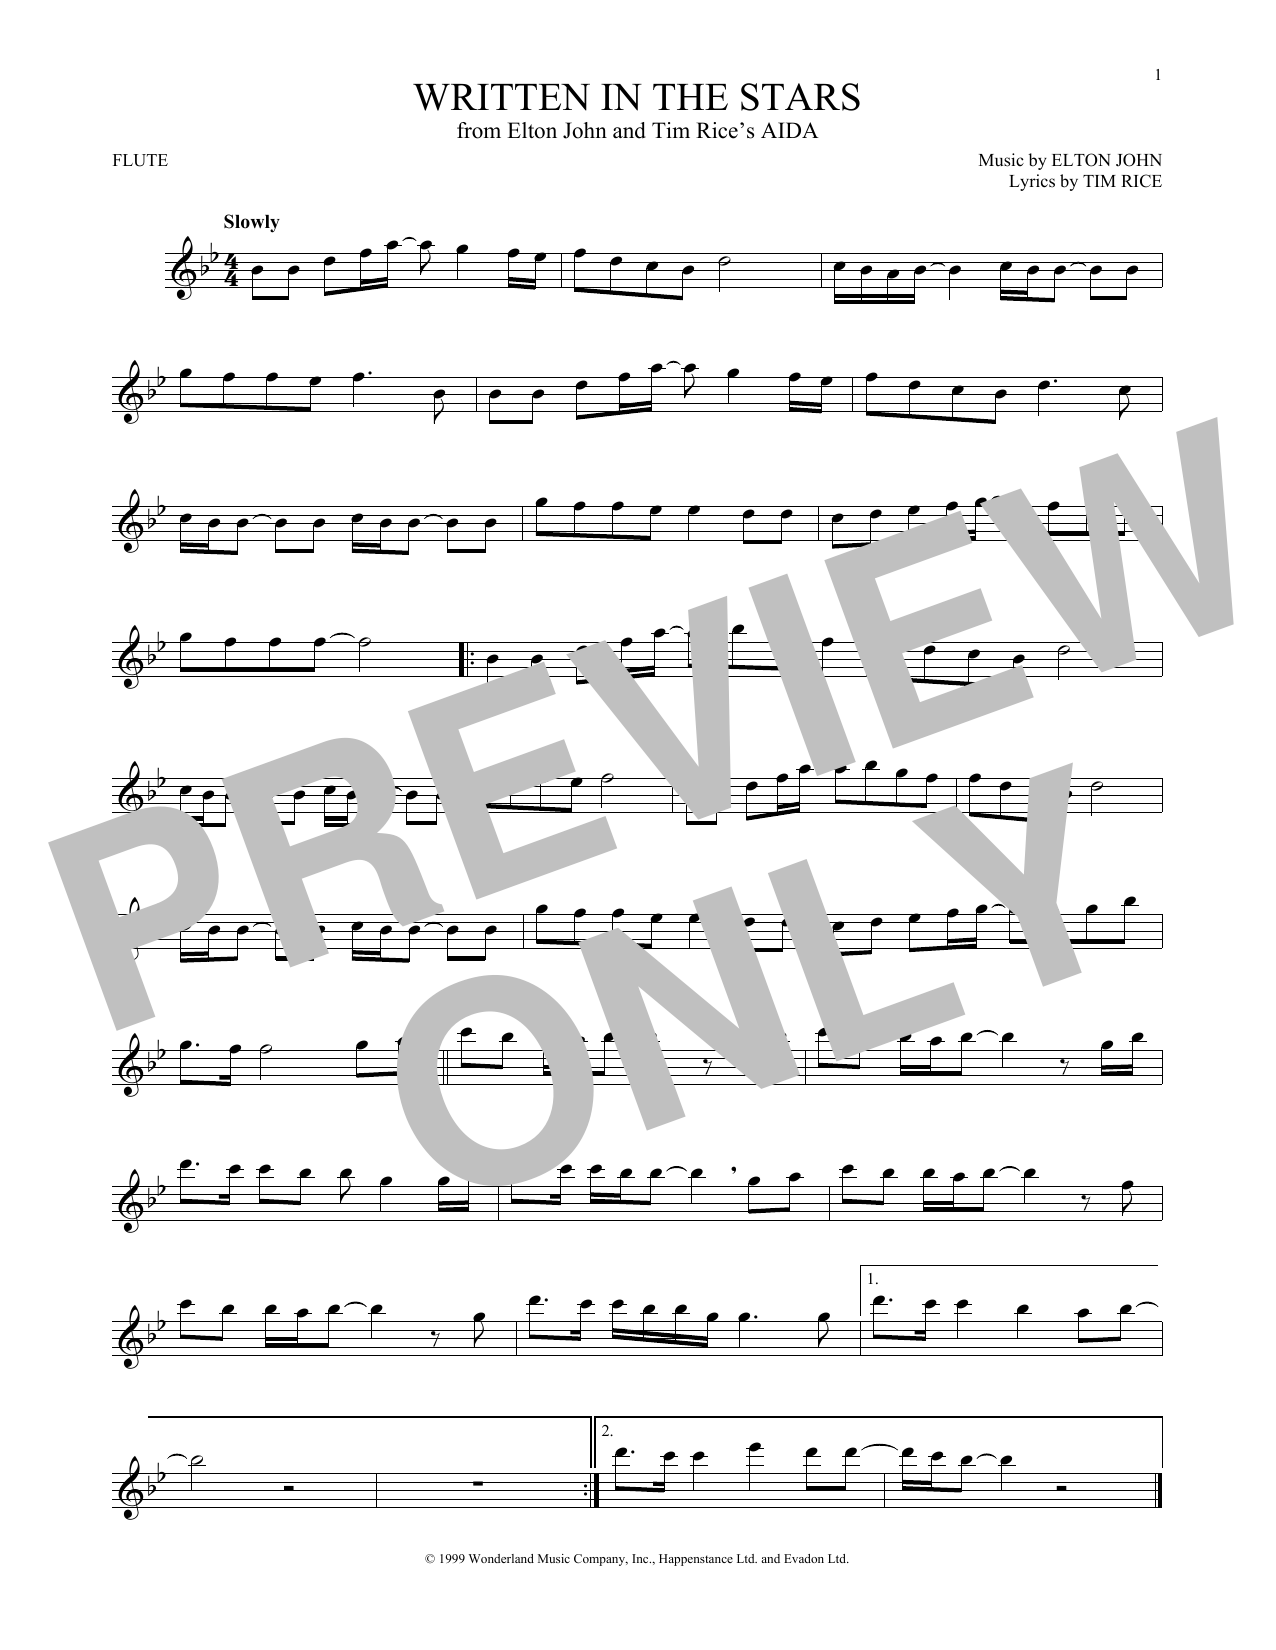 Partition flûte Written In The Stars de Elton John & LeAnn Rimes - Flute traversiere